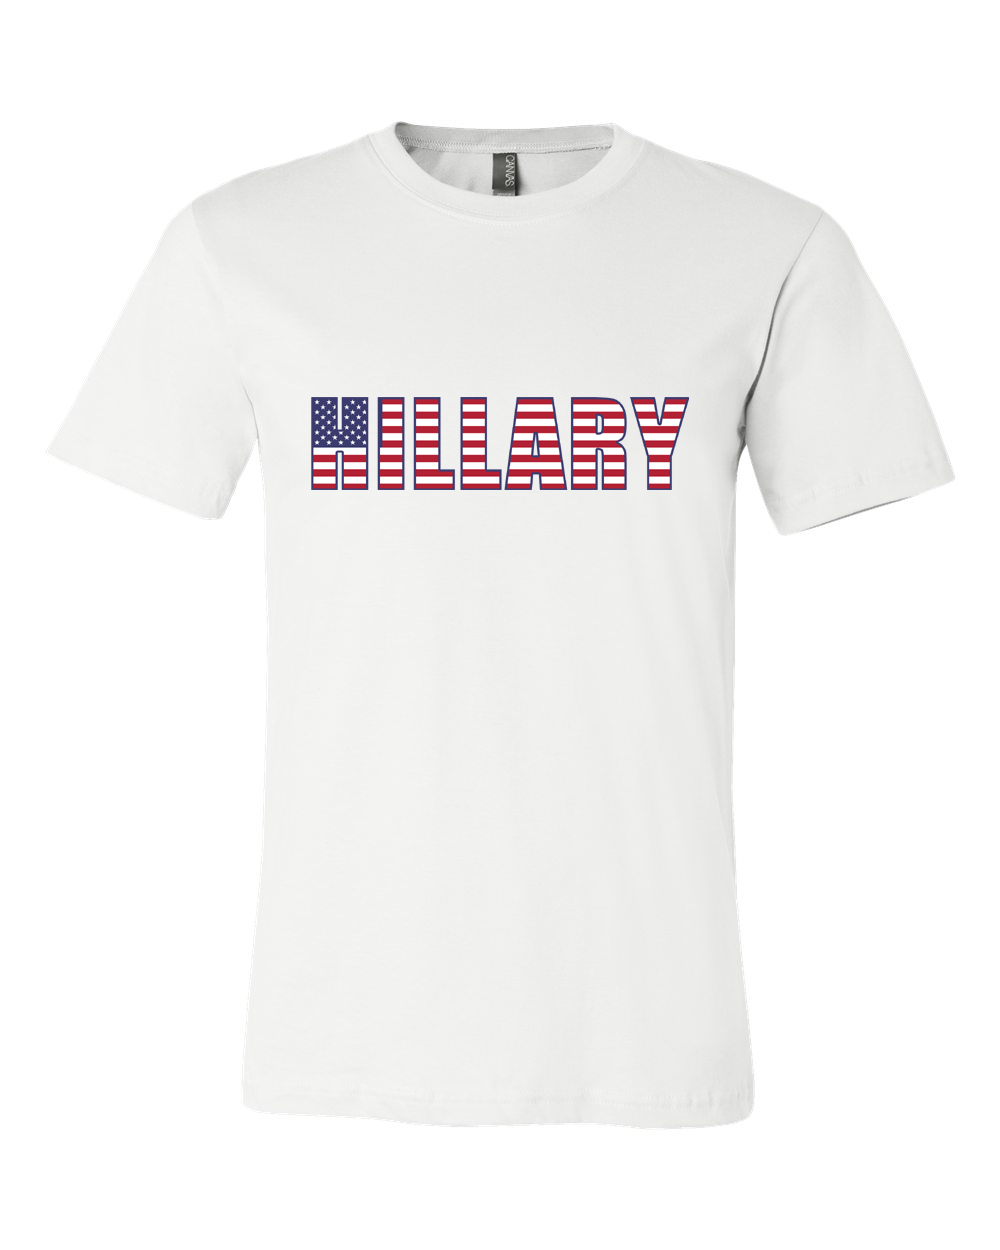 Hillary-Unisex-Short-Sleeve-Jersey-T-Shirt-by-iTEE.com